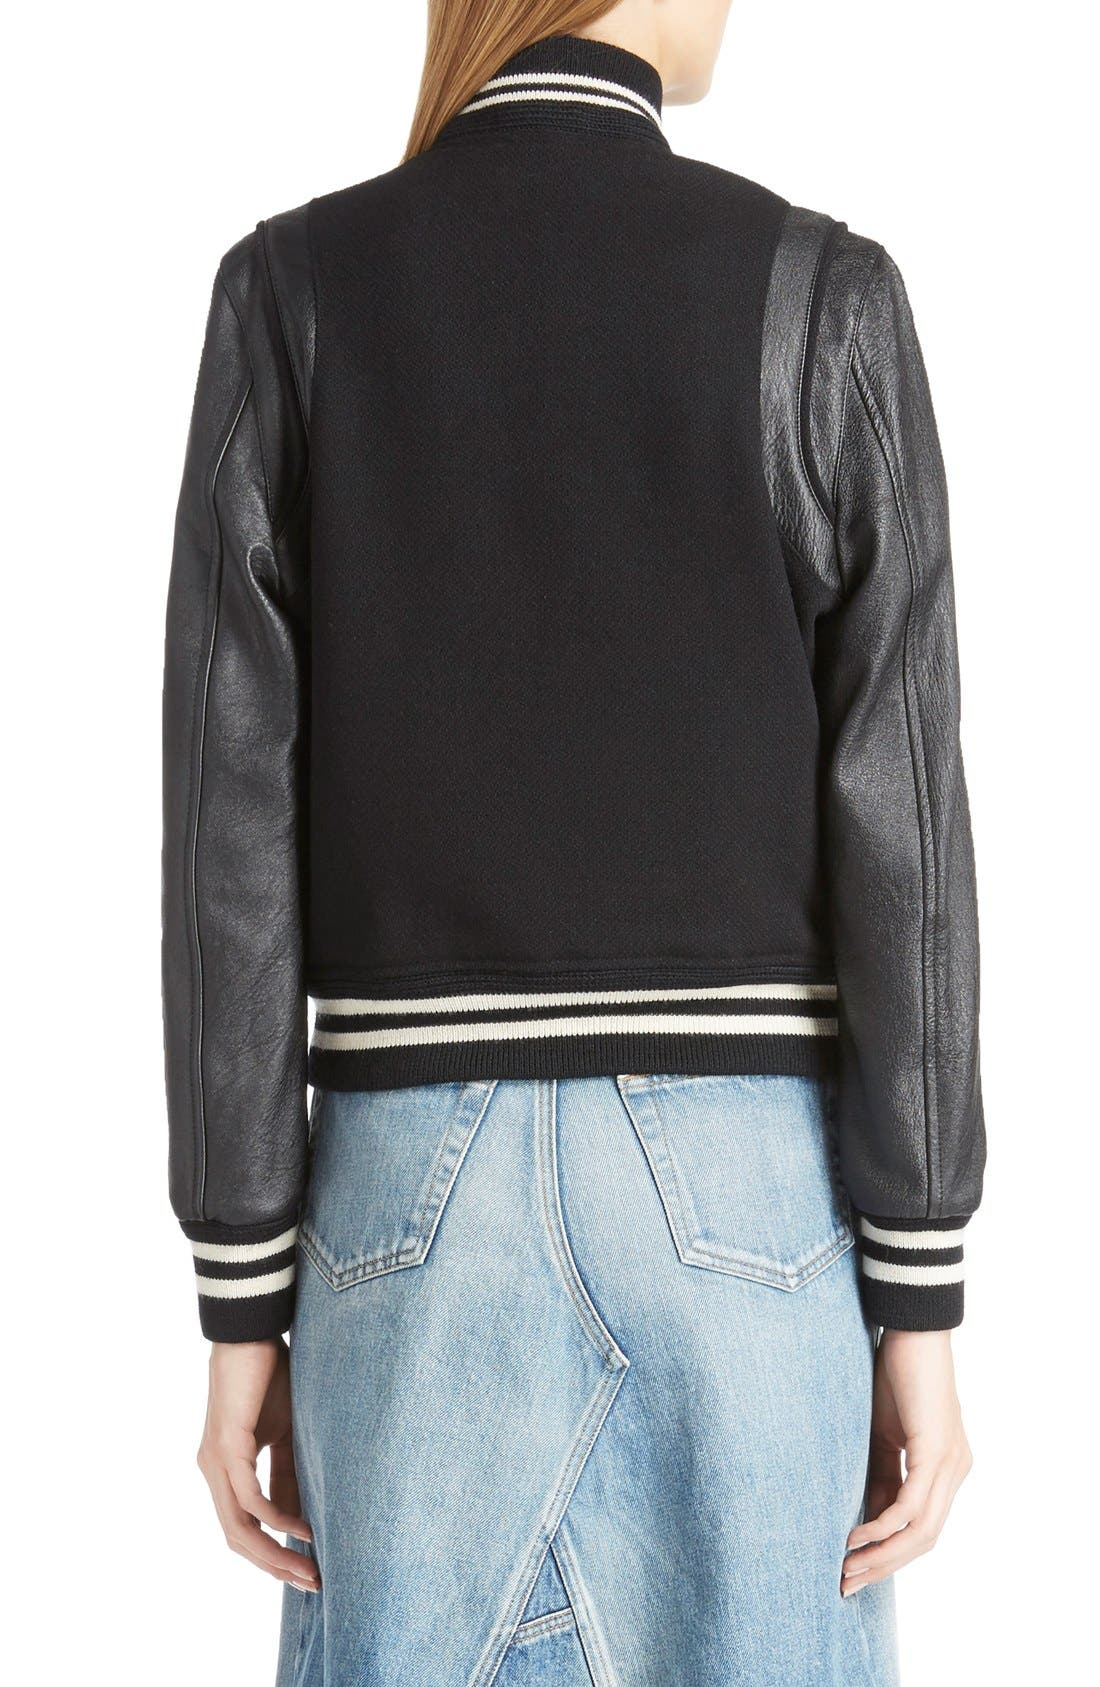 Alternate Image 2  - Saint Laurent 'Teddy' Full Leather Sleeve Bomber Jacket